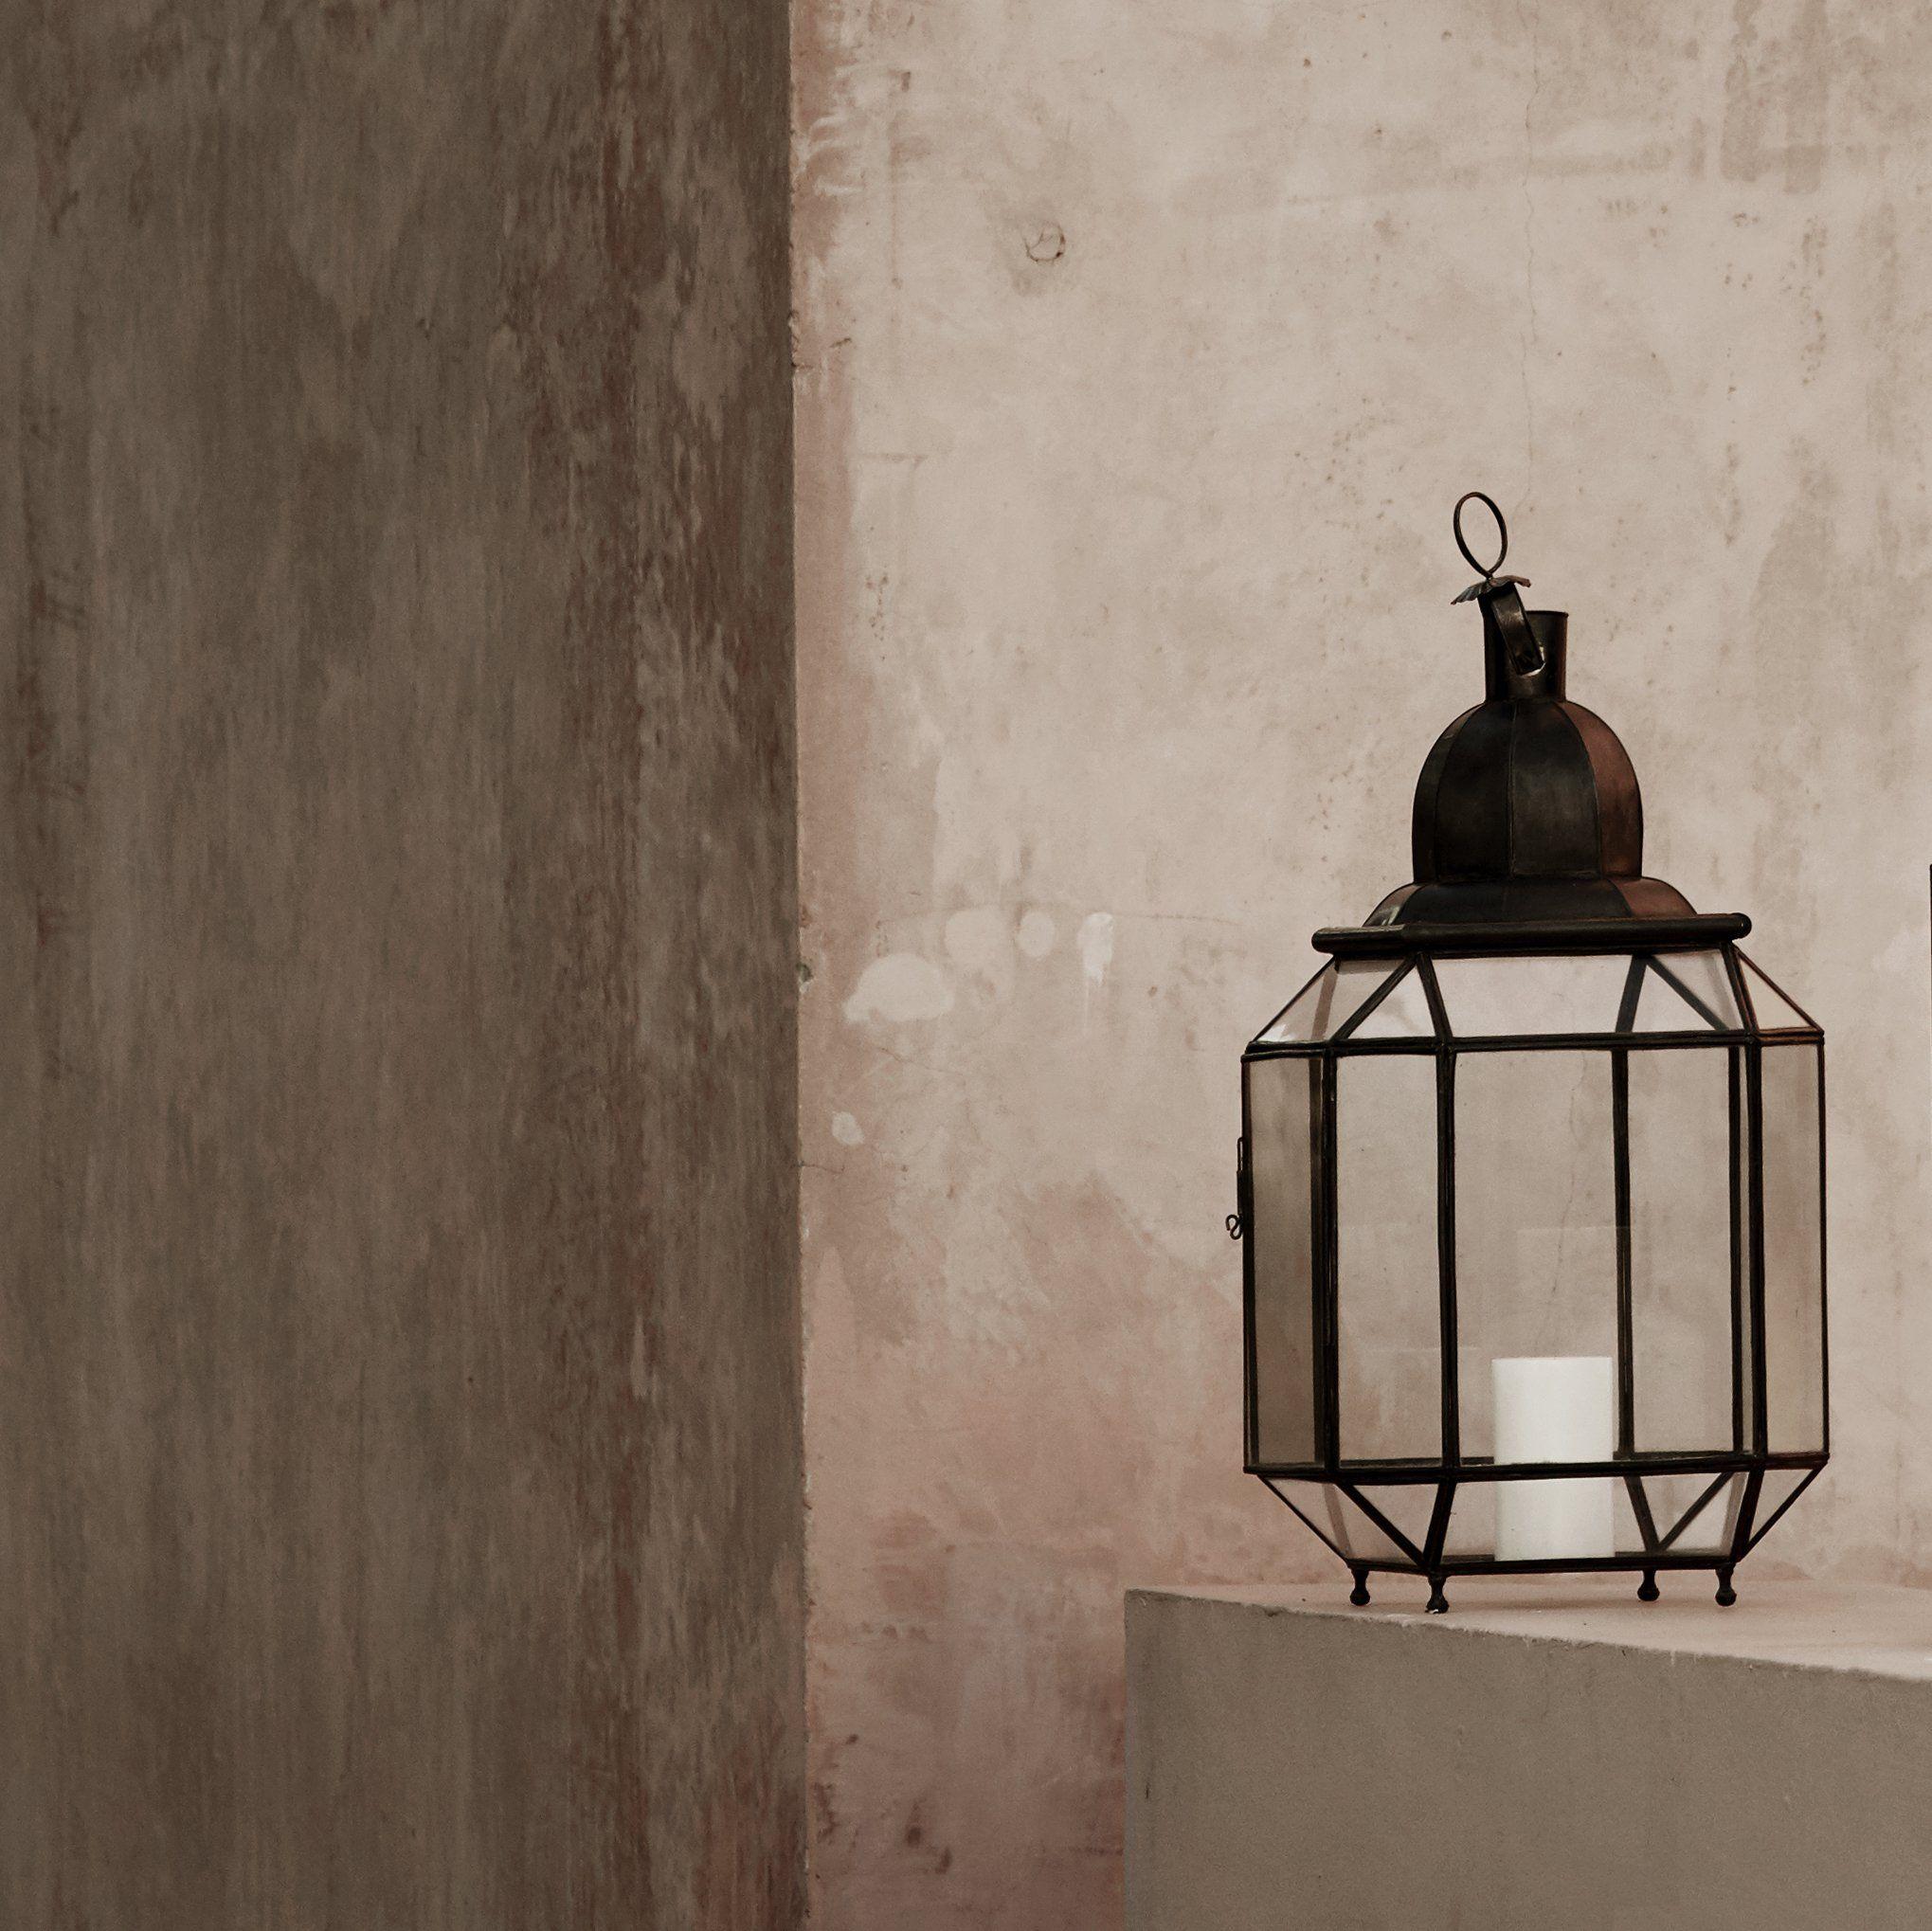 Handmade Moroccan Outdoor Lantern Tine K Home Design Vintage Vintage Lighting Outdoor Lanterns Vintage Lanterns